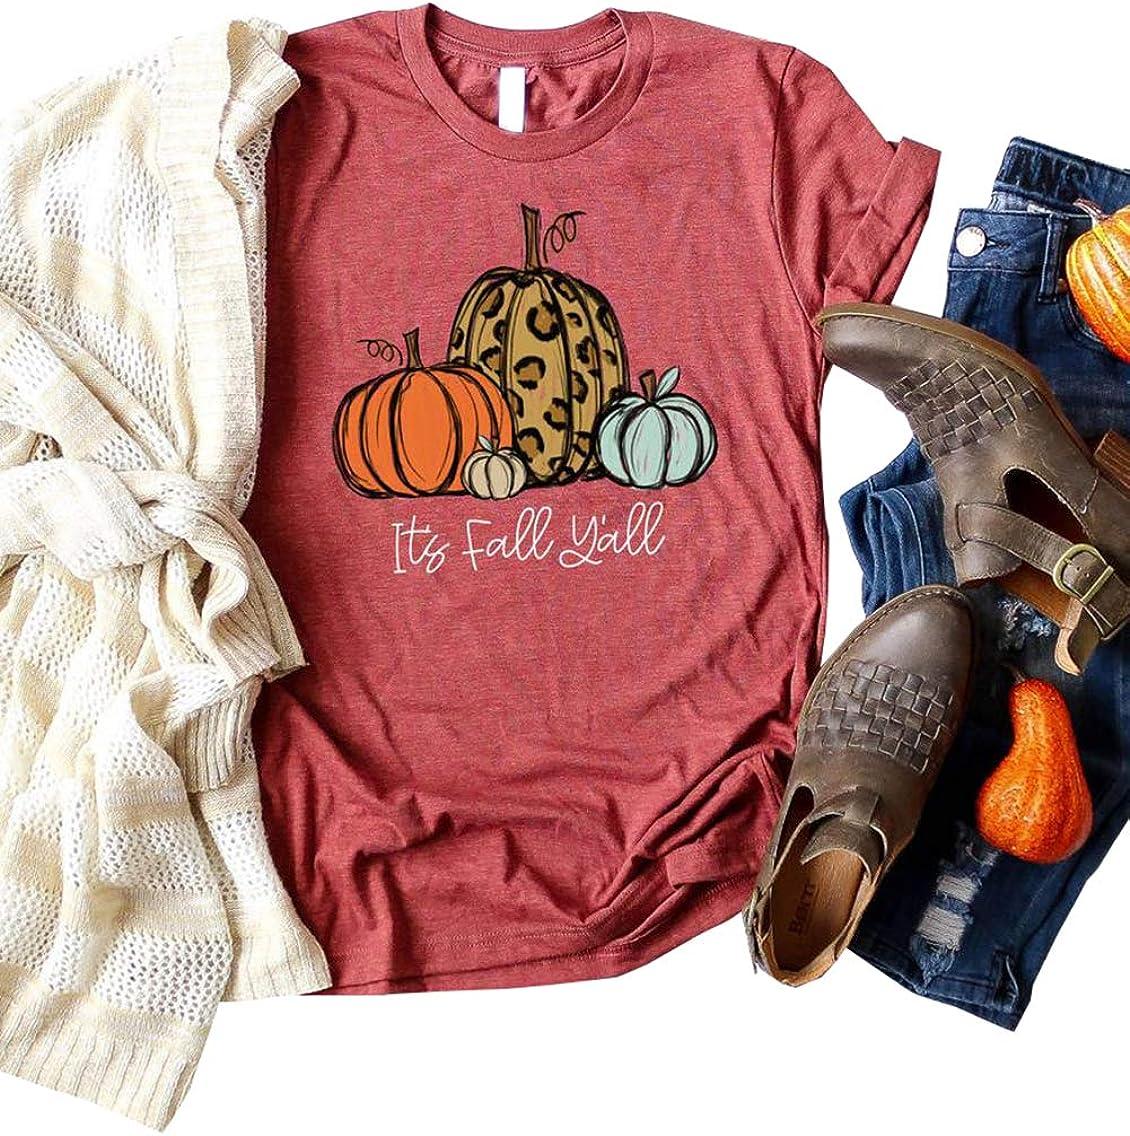 Halloween Pumpkin Shirt Women Plaid Leopard Graphic Tees Funny Cute Short Sleeve Fall Shirt Thanksgiving Gift Tops